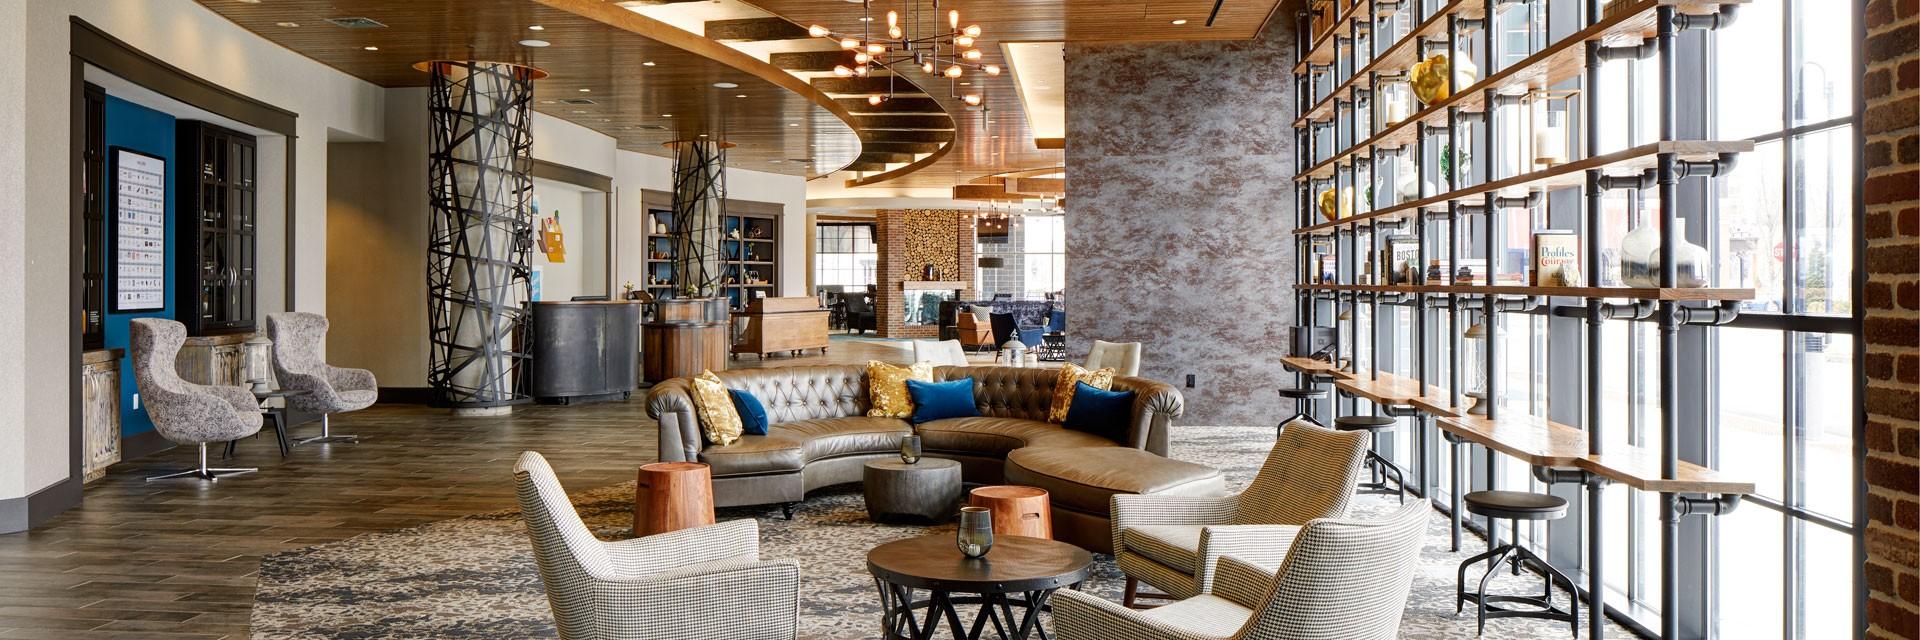 Archer Hotel Burlington Lobby Library Overview